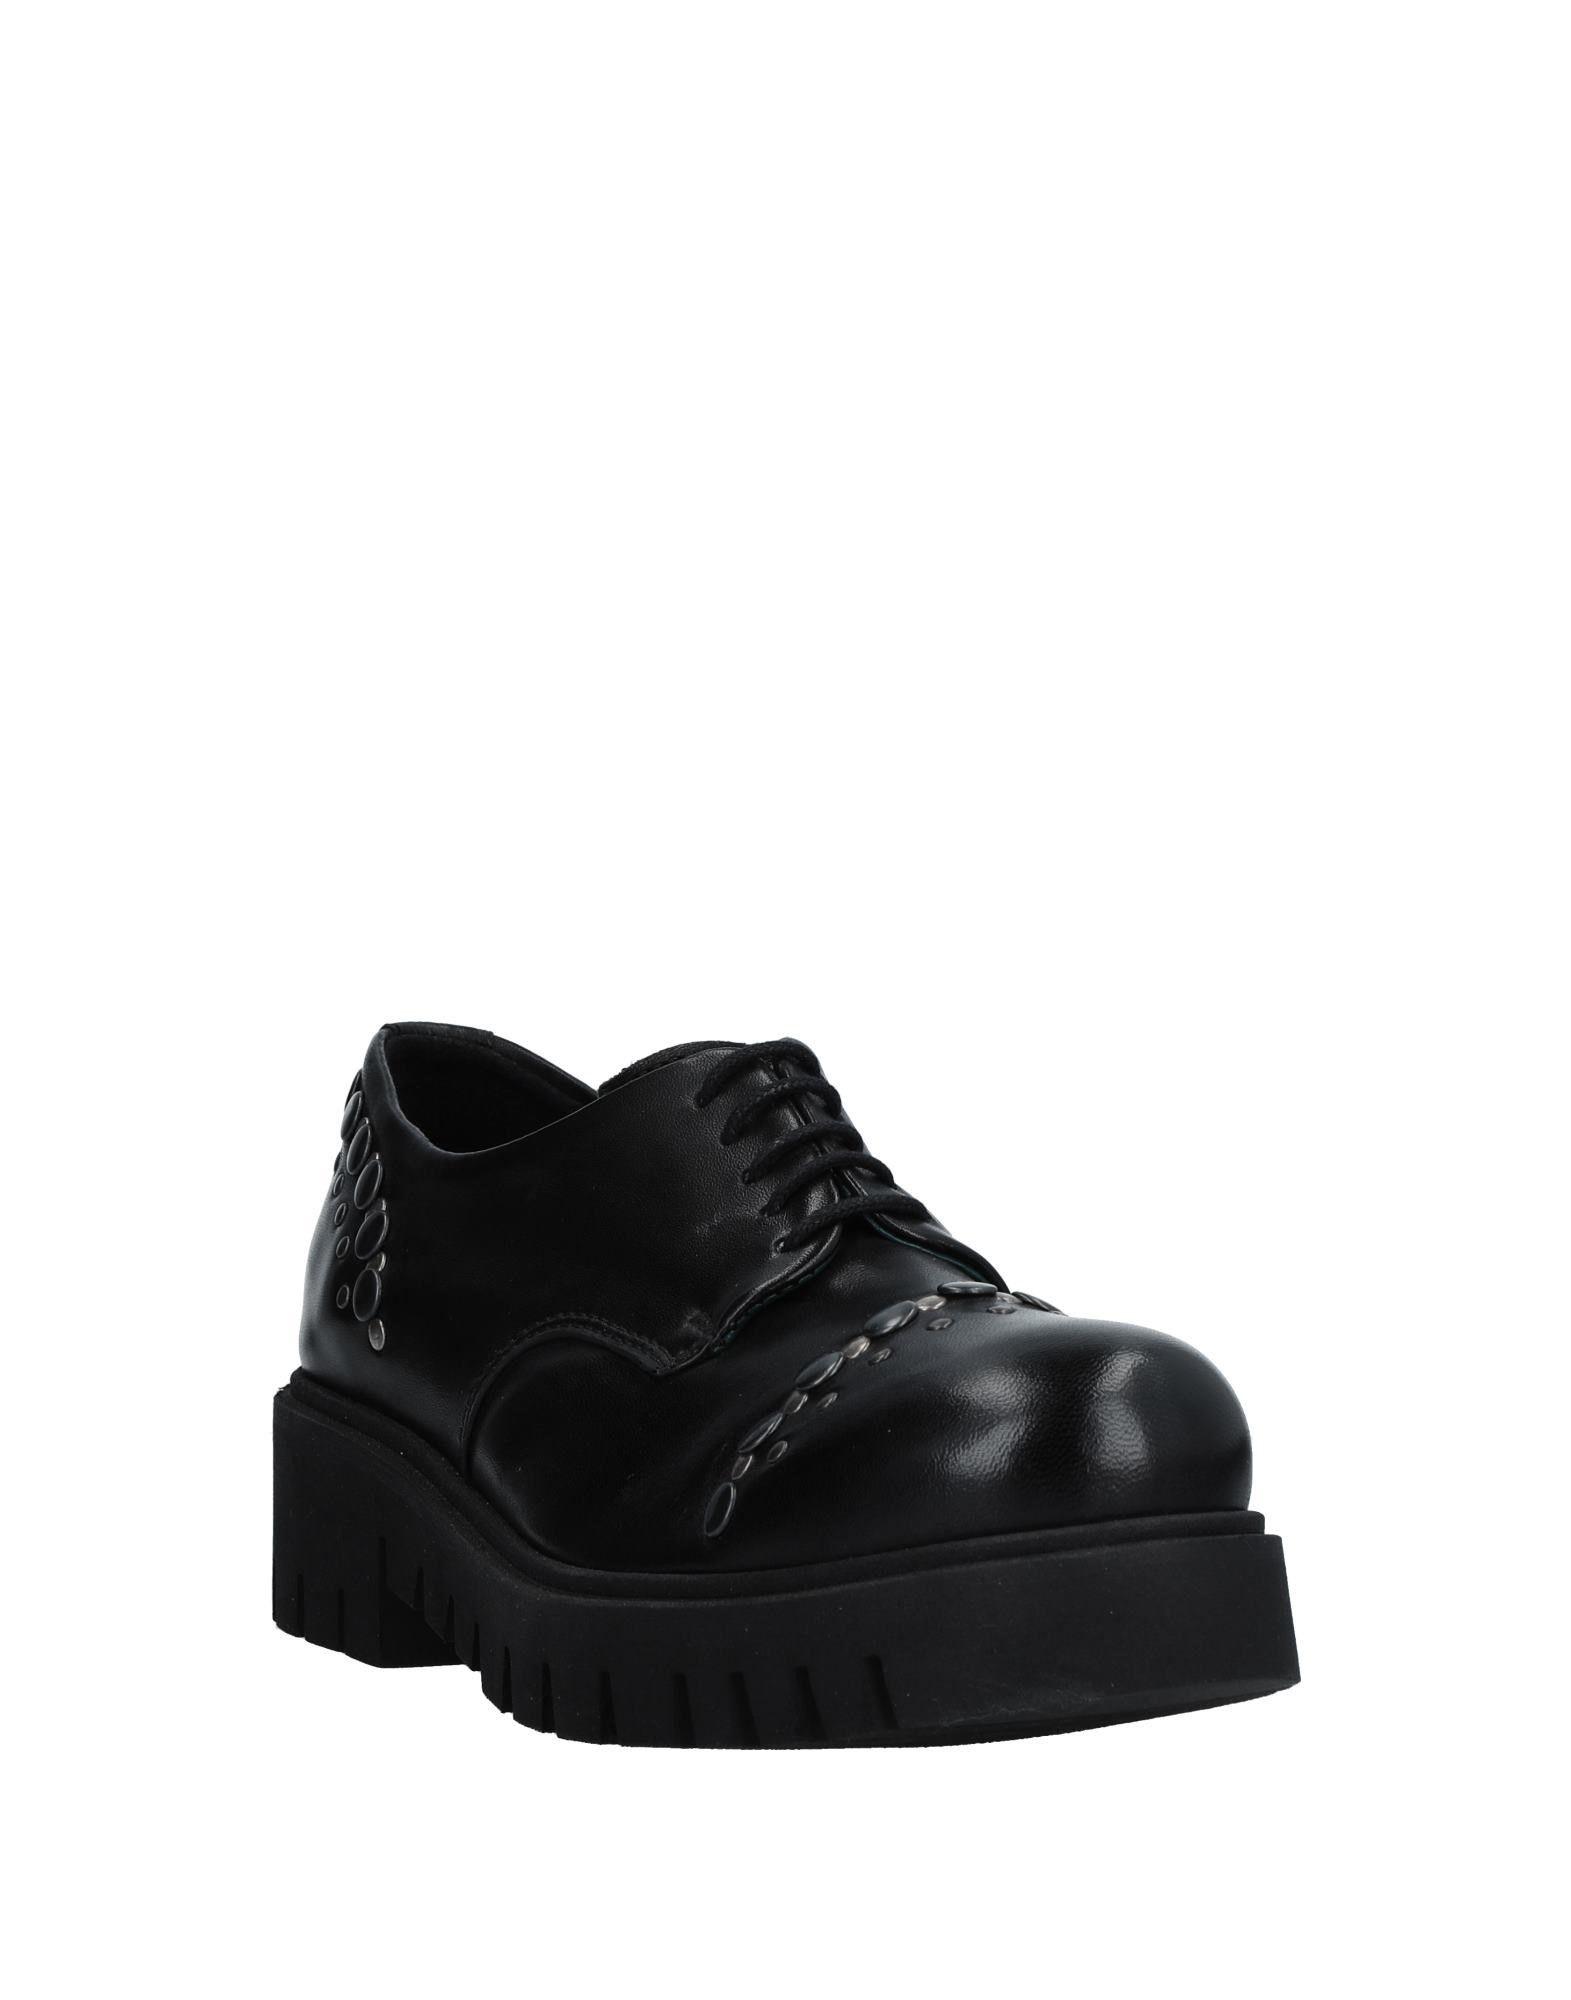 Fabbrica Deicolli Schnürschuhe Damen  11524865OQ Gute beliebte Qualität beliebte Gute Schuhe 76df7b